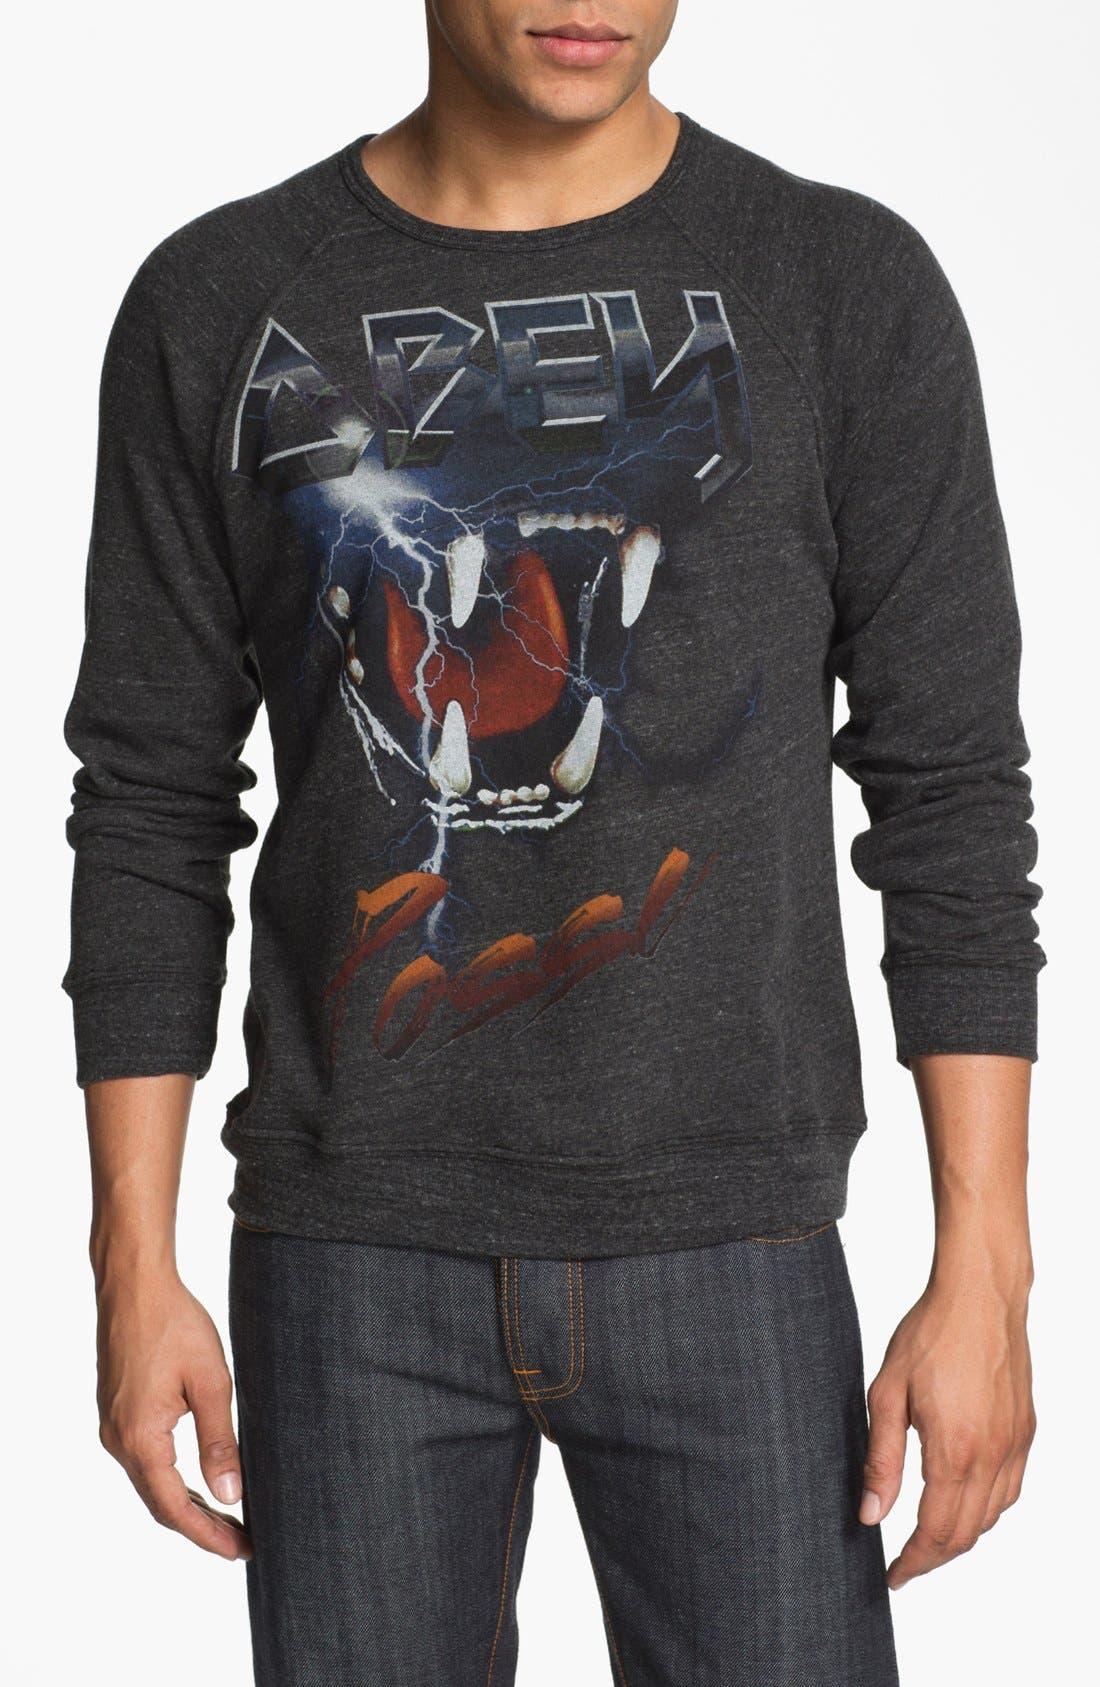 Alternate Image 1 Selected - Obey 'Lightning Tour' Sweatshirt